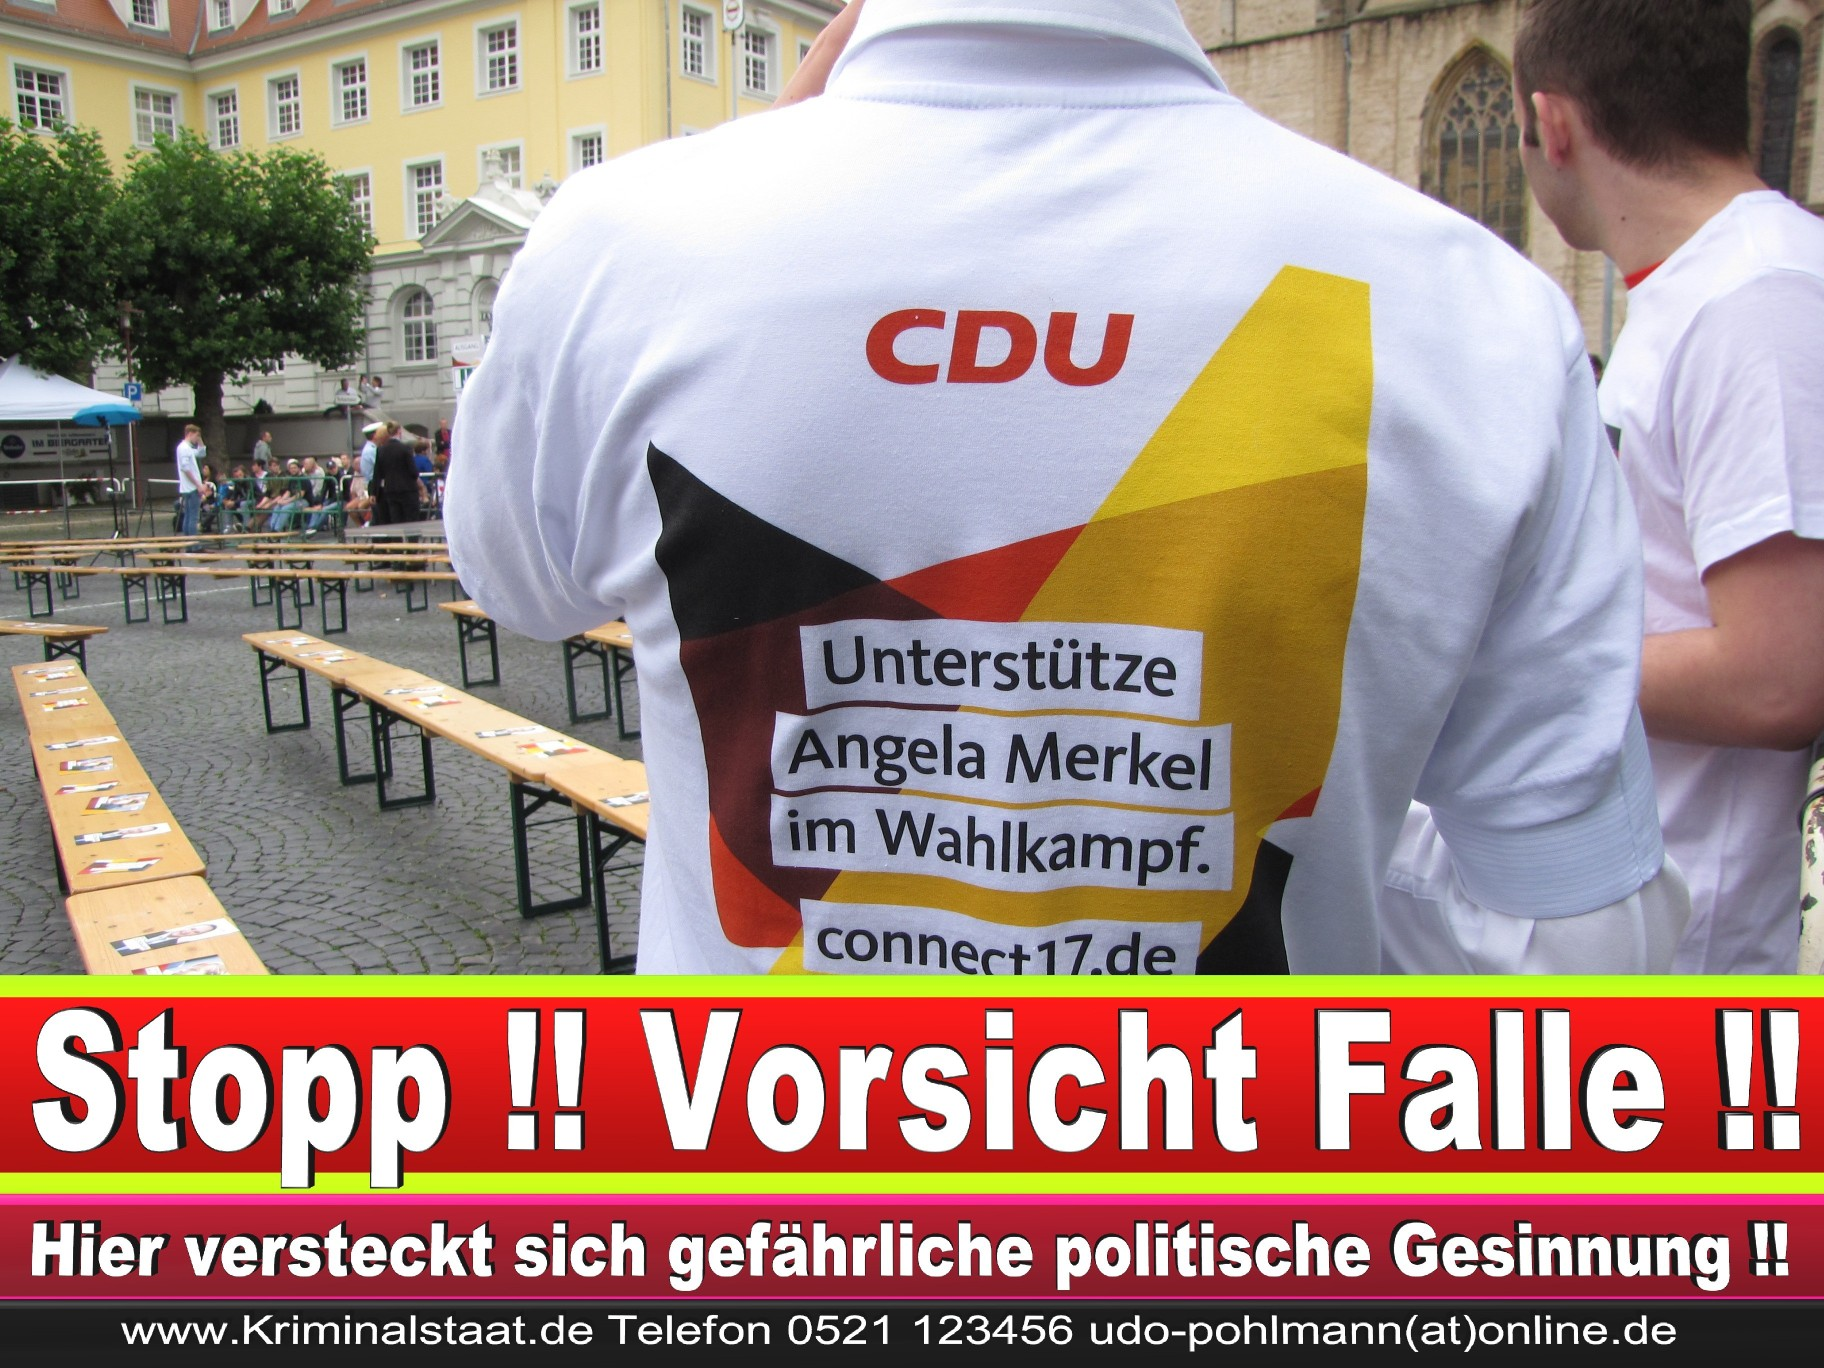 CDU HERFORD Kurruption Betrug Kinderpornografie Kinderpornos 9